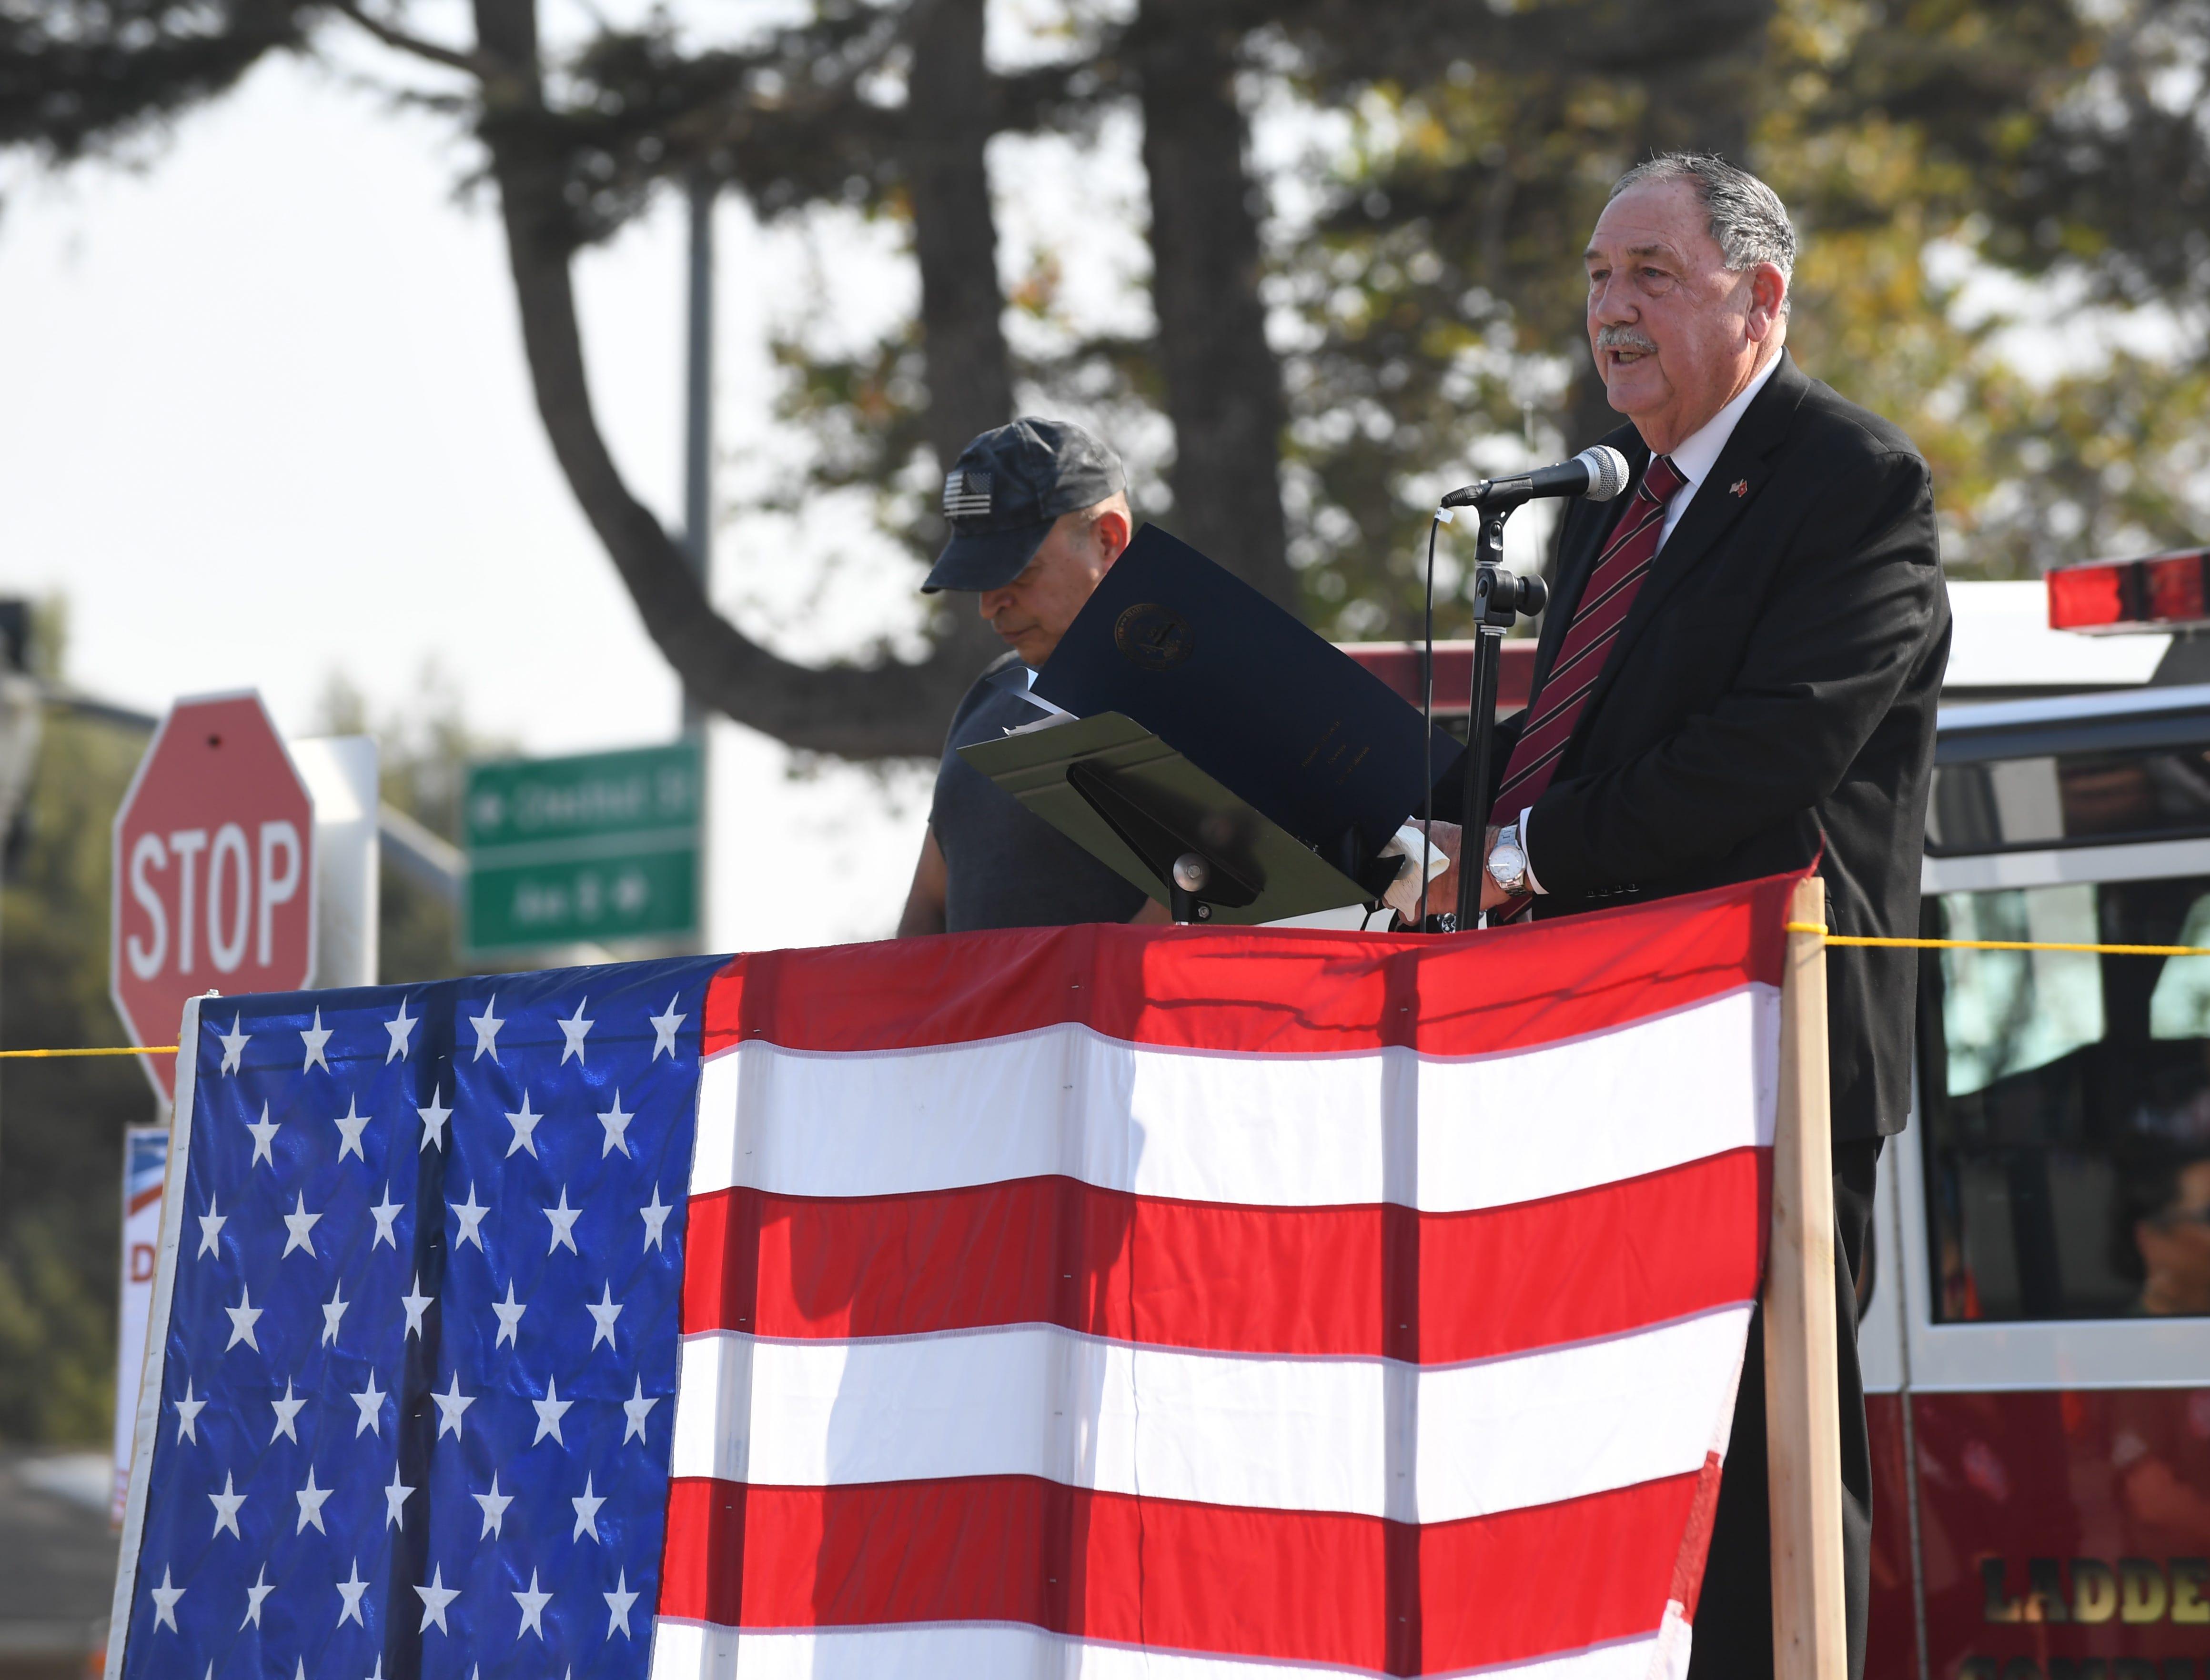 Mayor Joe Gunter, a Marine Corps veteran, addresses the crowd at Sunday's Monterey County Veterans Day Parade in Salinas.